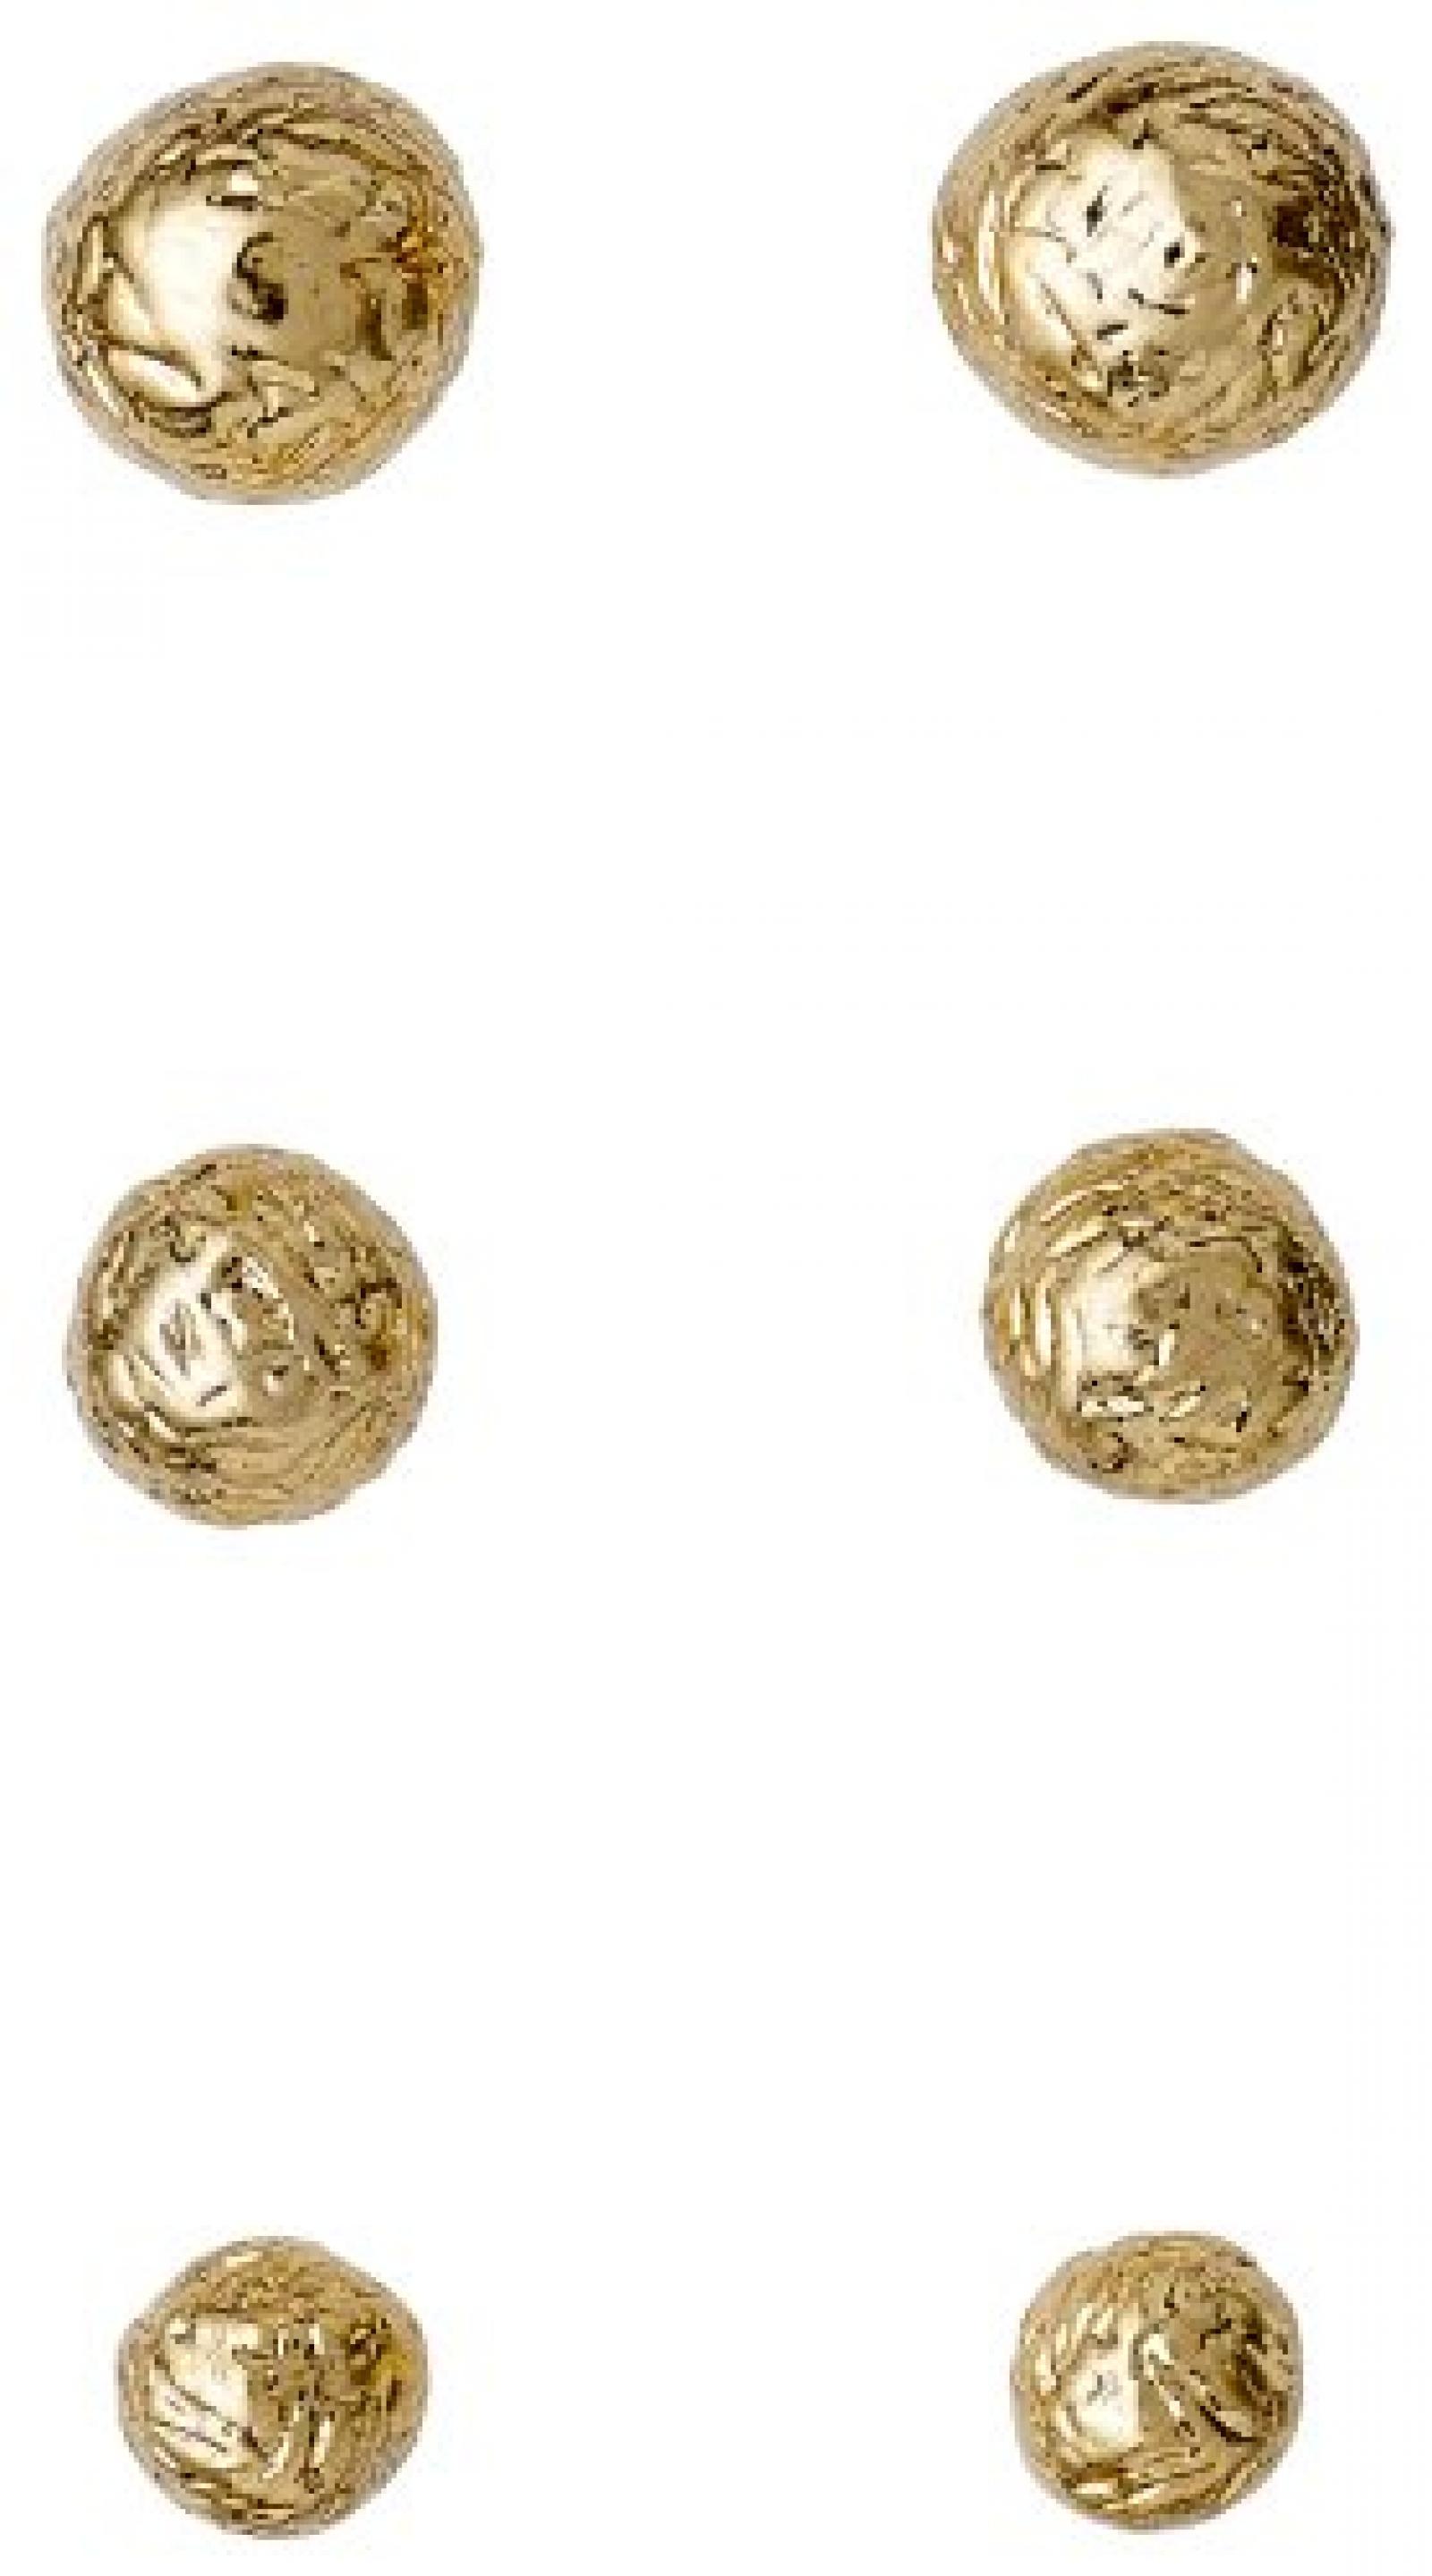 Pilgrim Jewelry Damen-Set: 3 Paar Ohrstecker Messing Ear post Vergoldet 0 0.3/0.4/0.5 cm 311342003